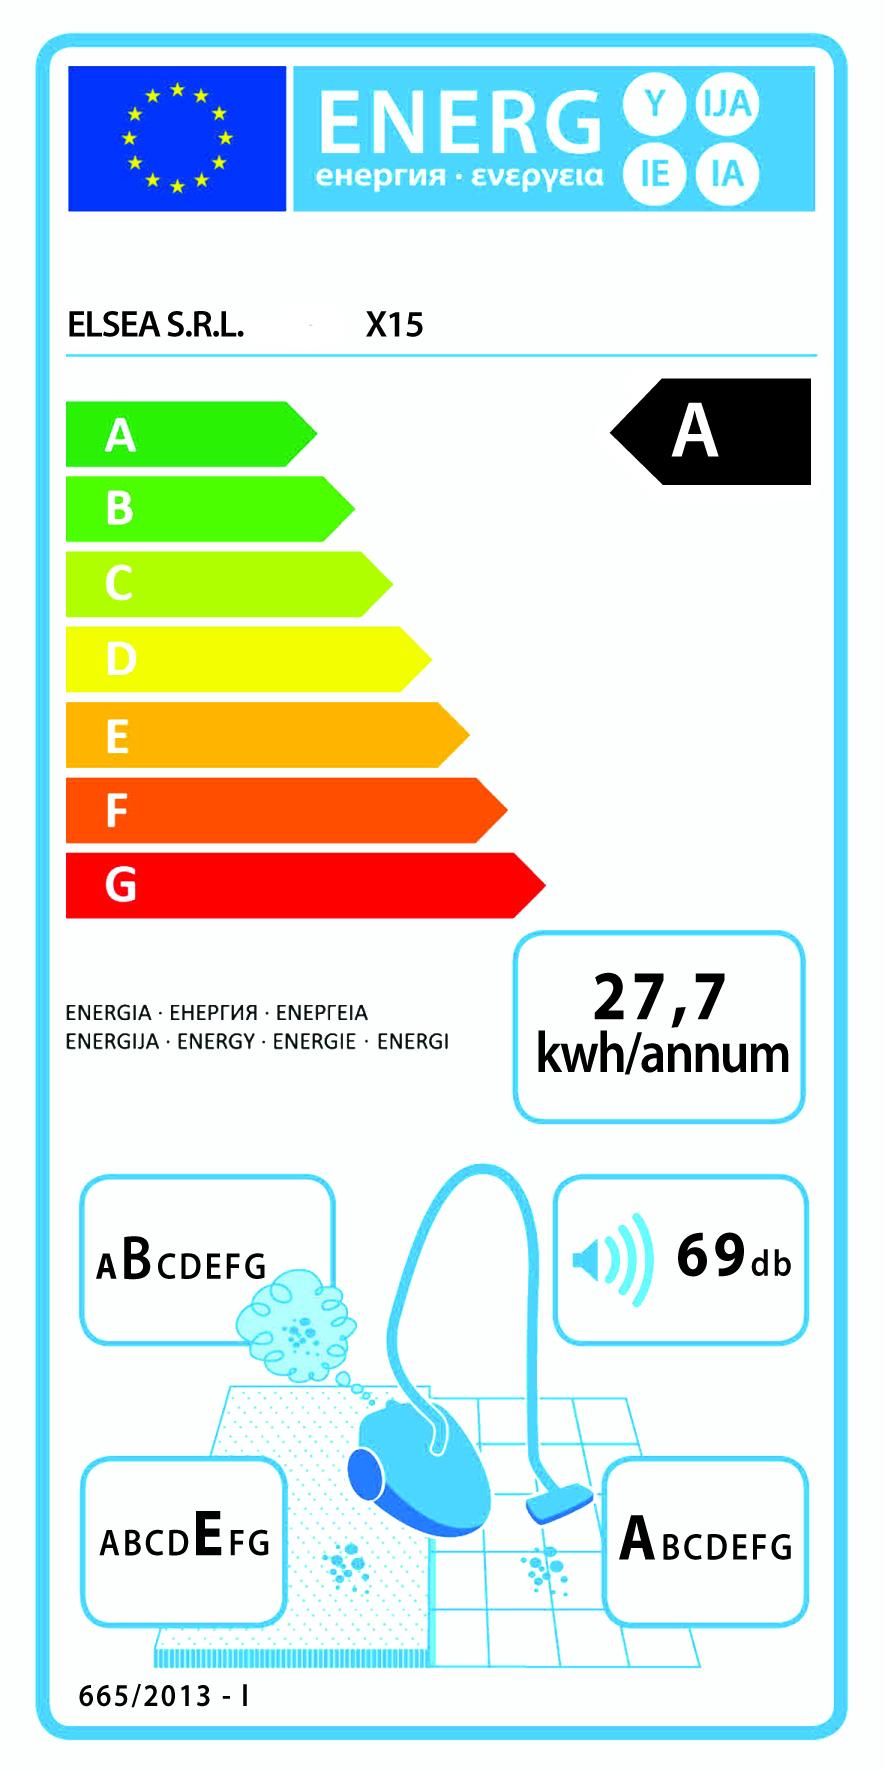 características energéticas